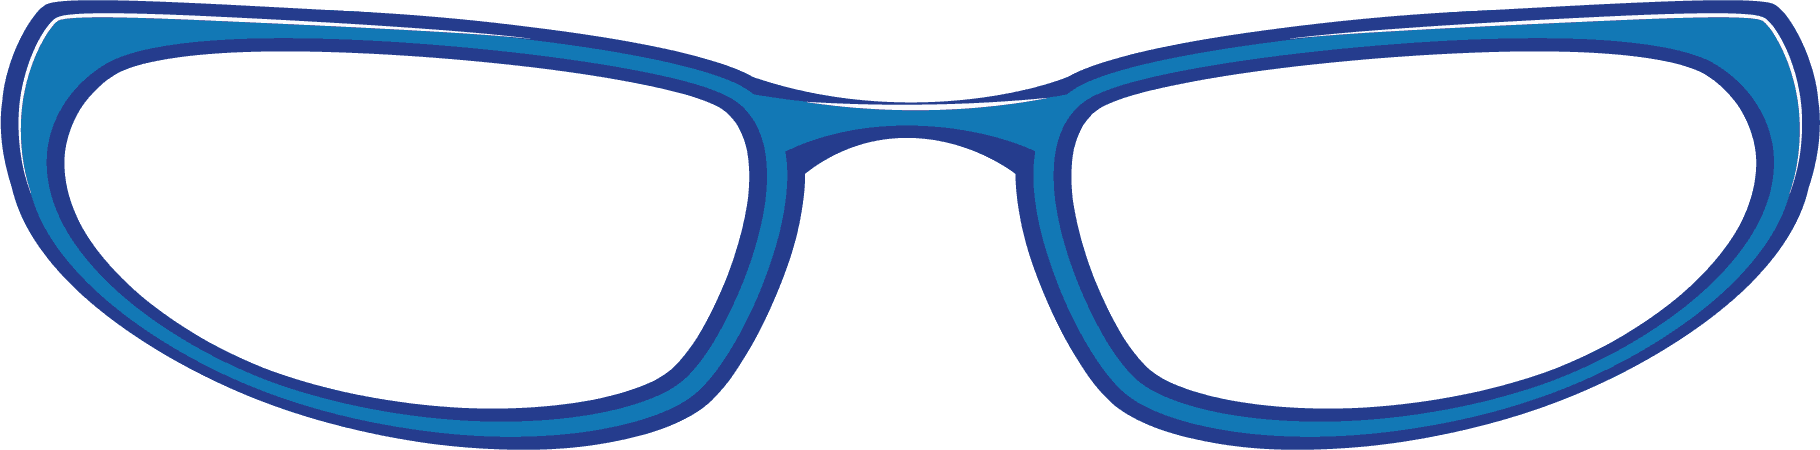 1820x450 Blue Eyes Clipart Glass Clip Art